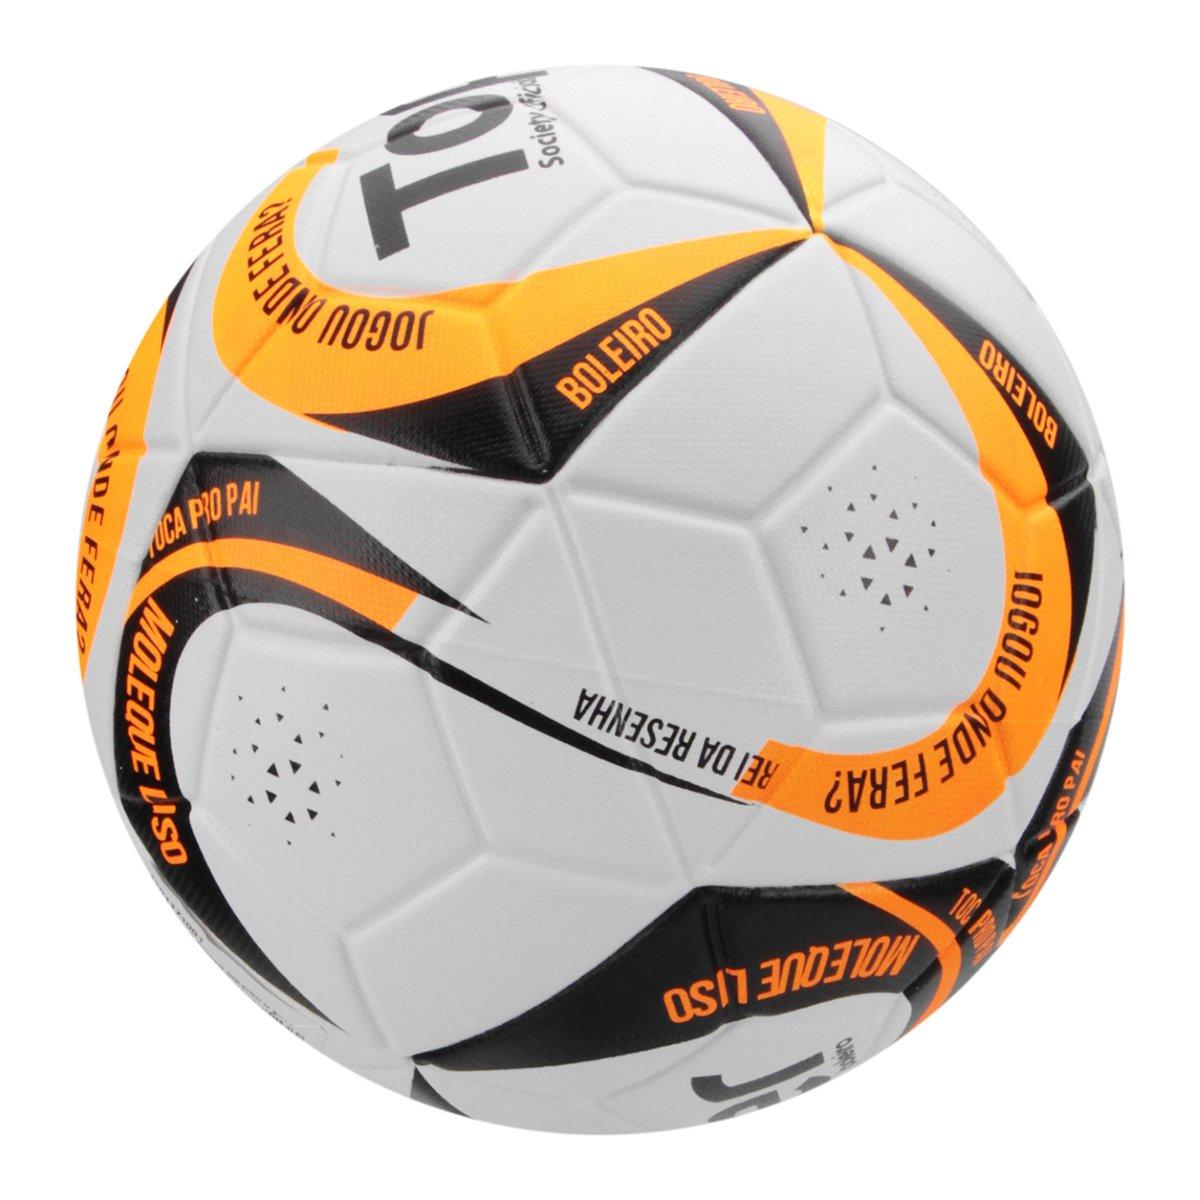 Bola Futebol Society Topper Boleiro  Bola Futebol Society Topper Boleiro e0e72410fd00a